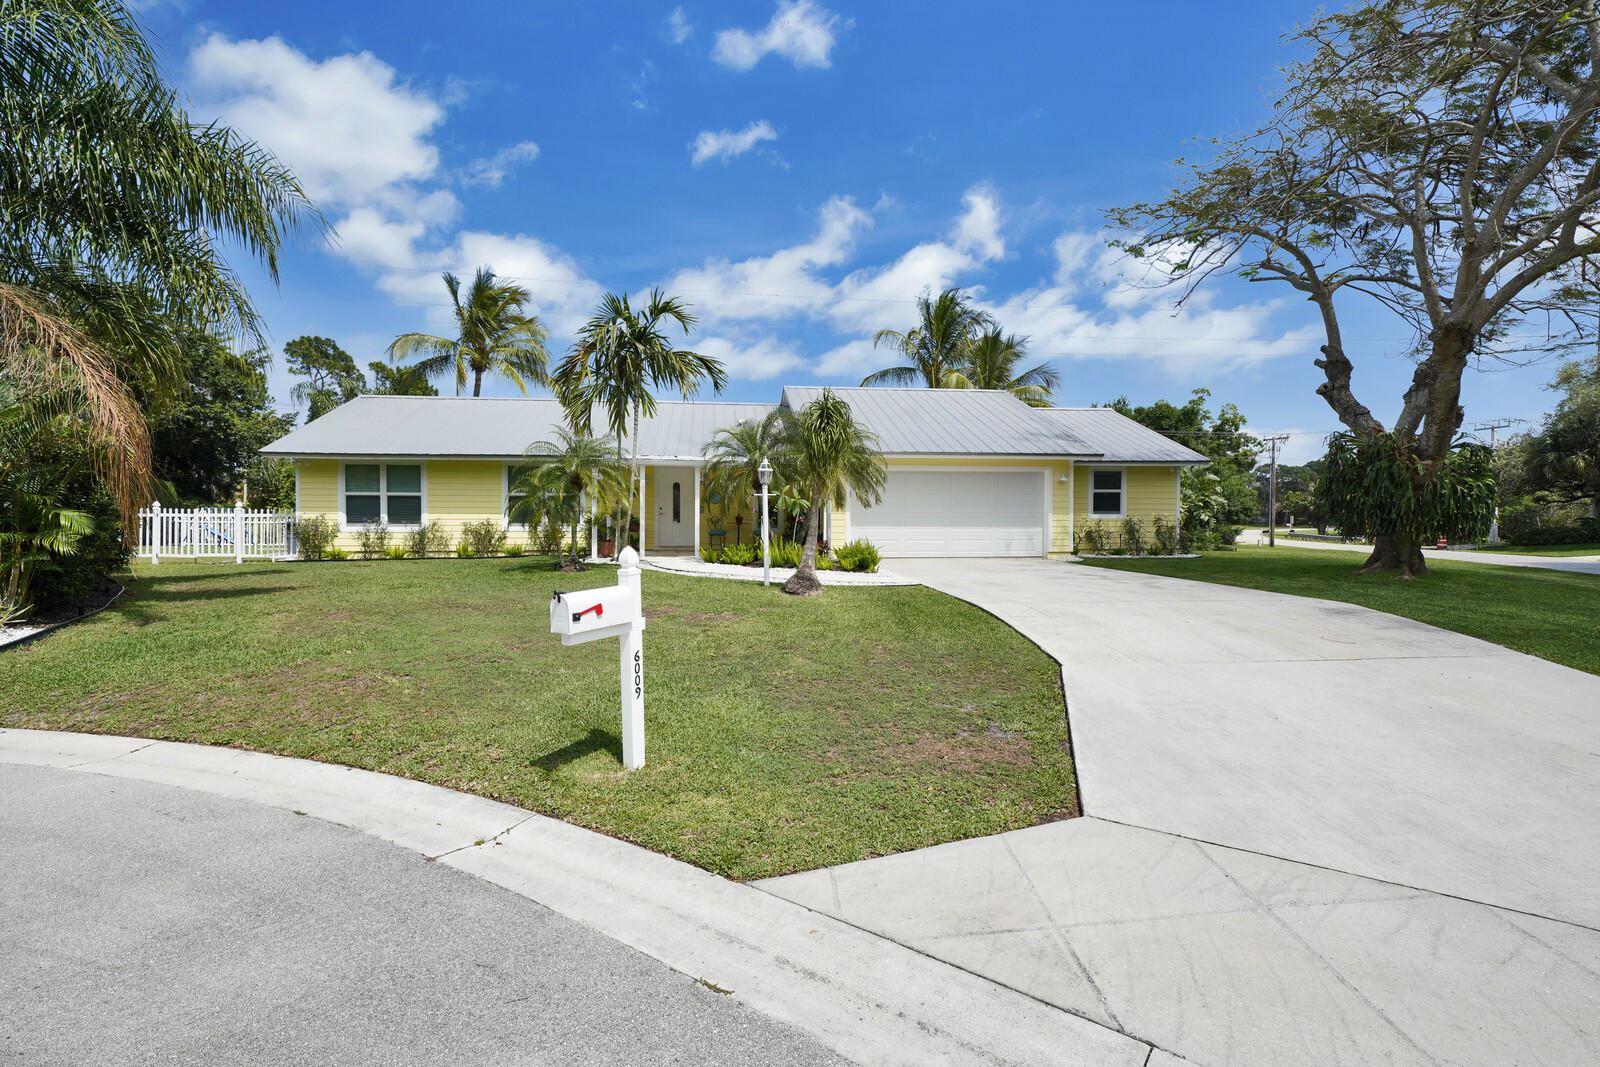 6009 Eagles Nest Drive, Jupiter, FL 33458 - MLS#: RX-10710484